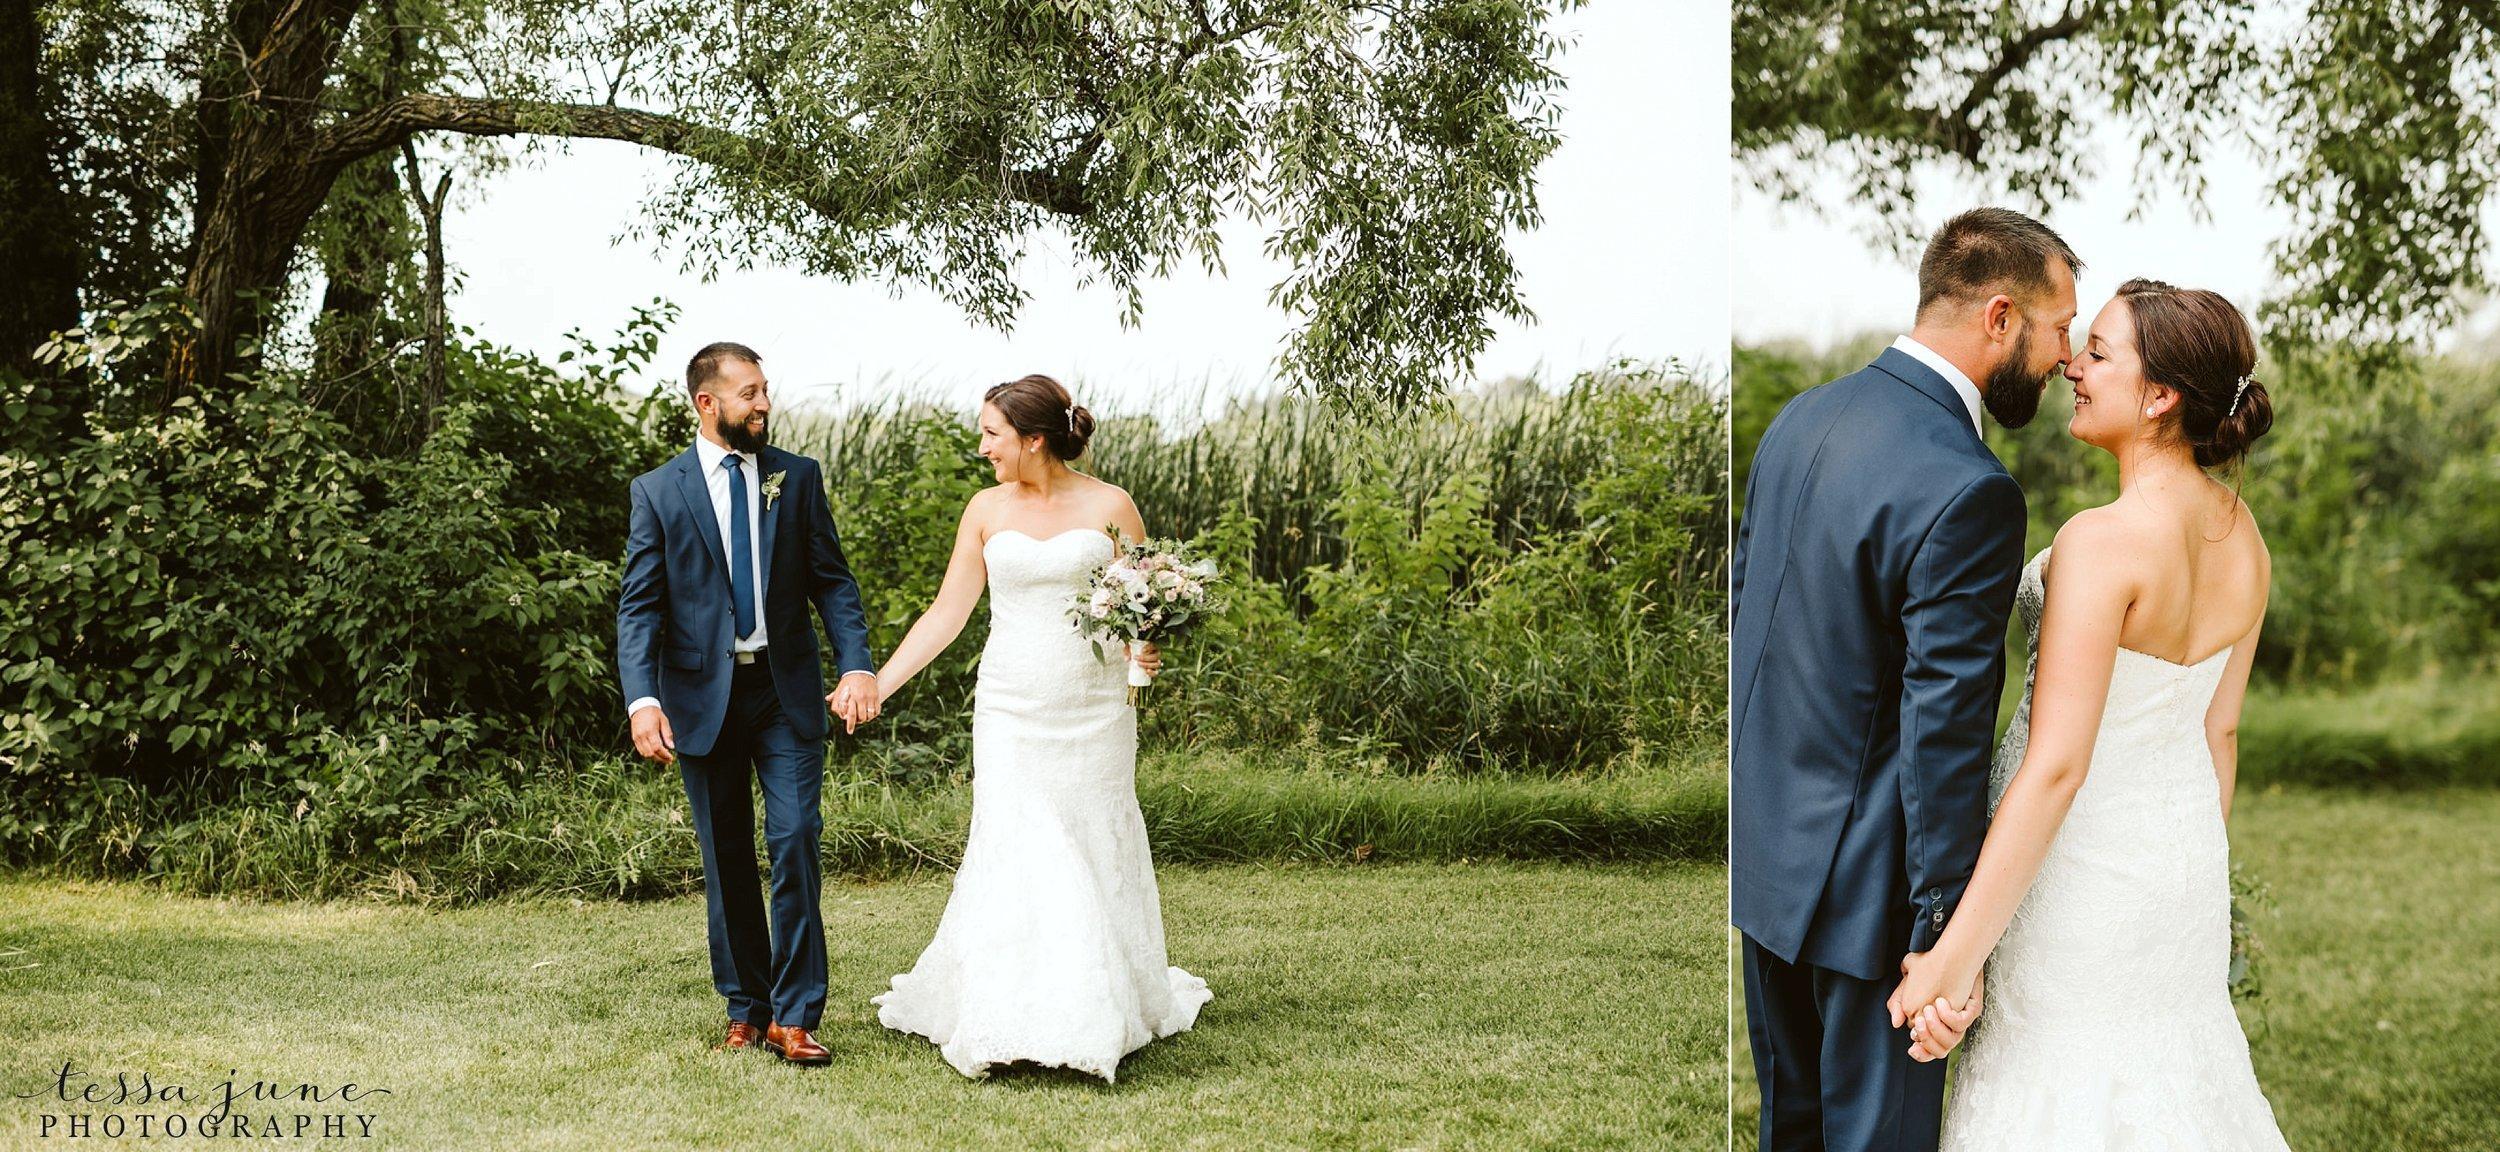 gathered-oaks-barn-wedding-alexandria-minnesota-52.jpg